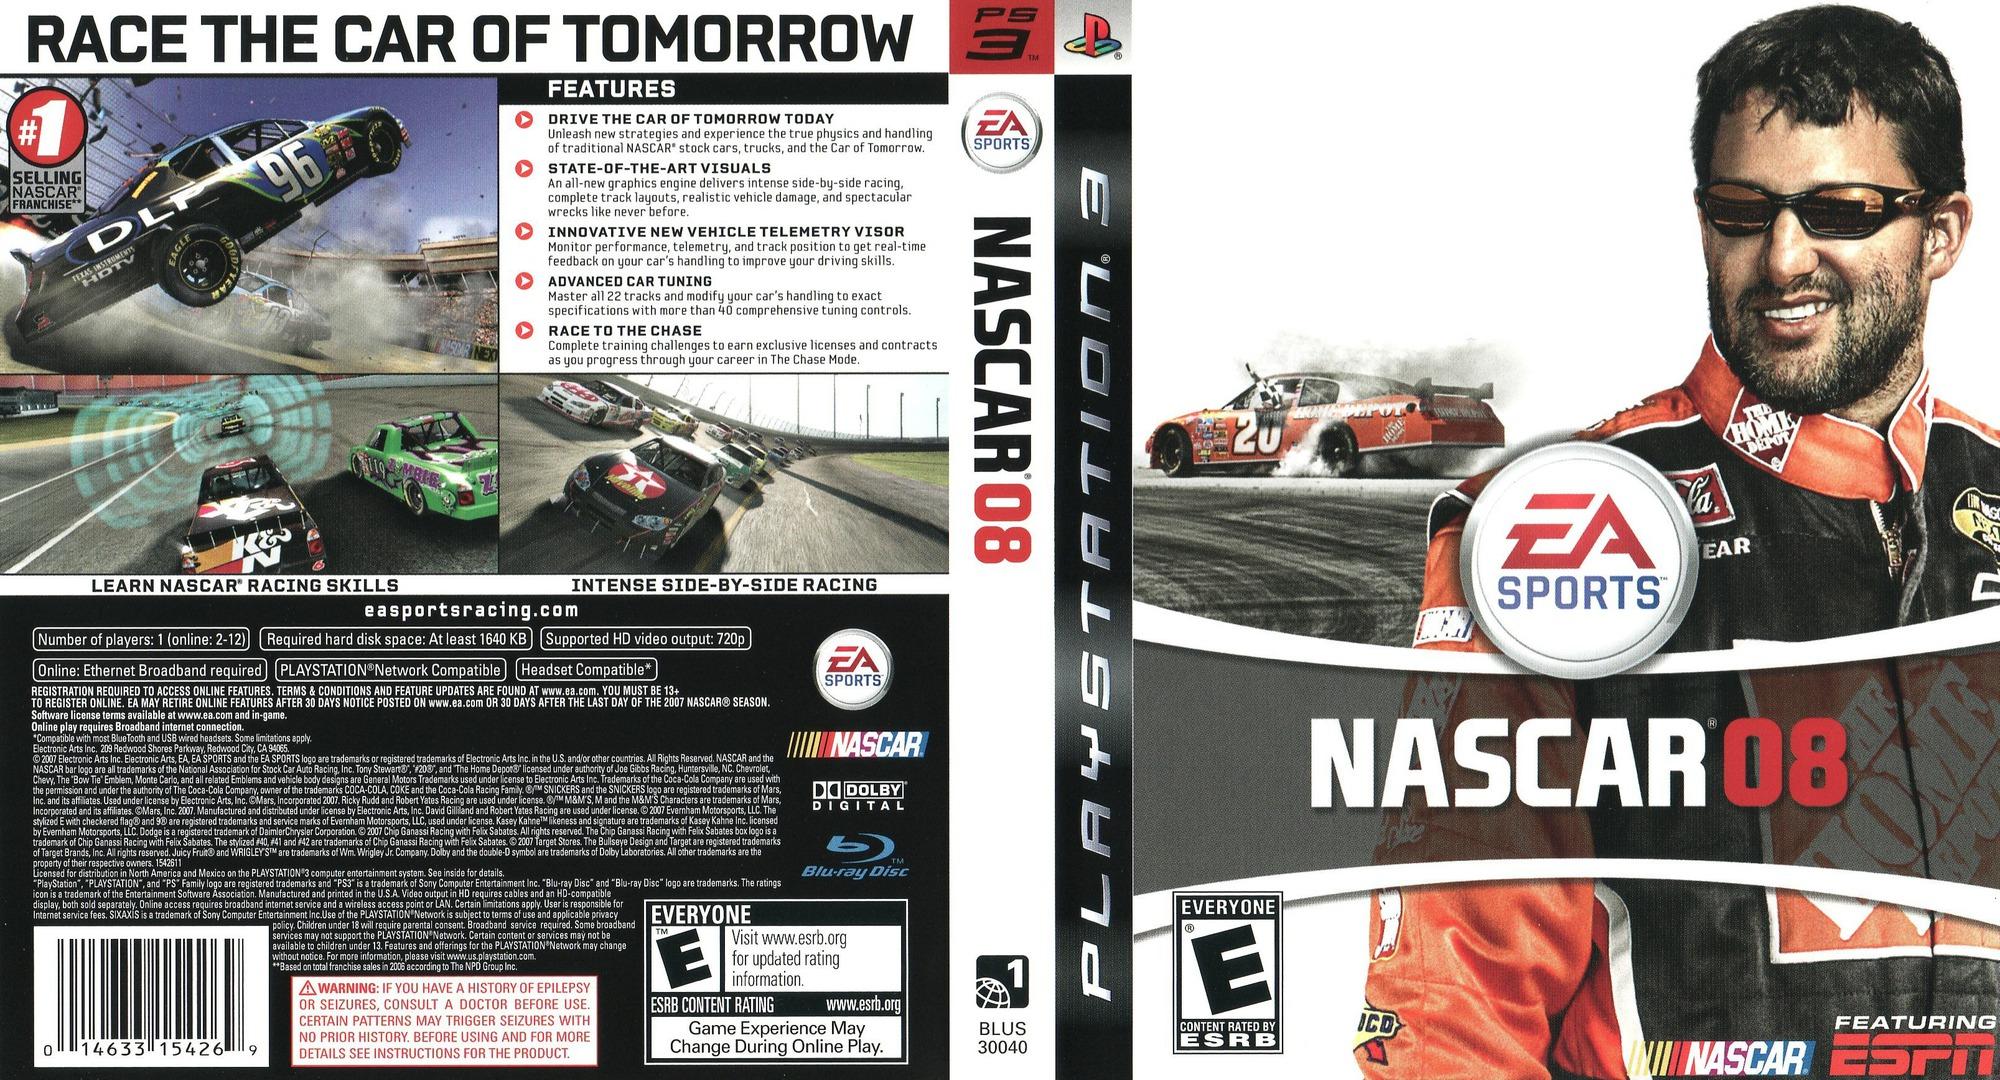 NASCAR '08 PS3 coverfullHQ (BLUS30040)